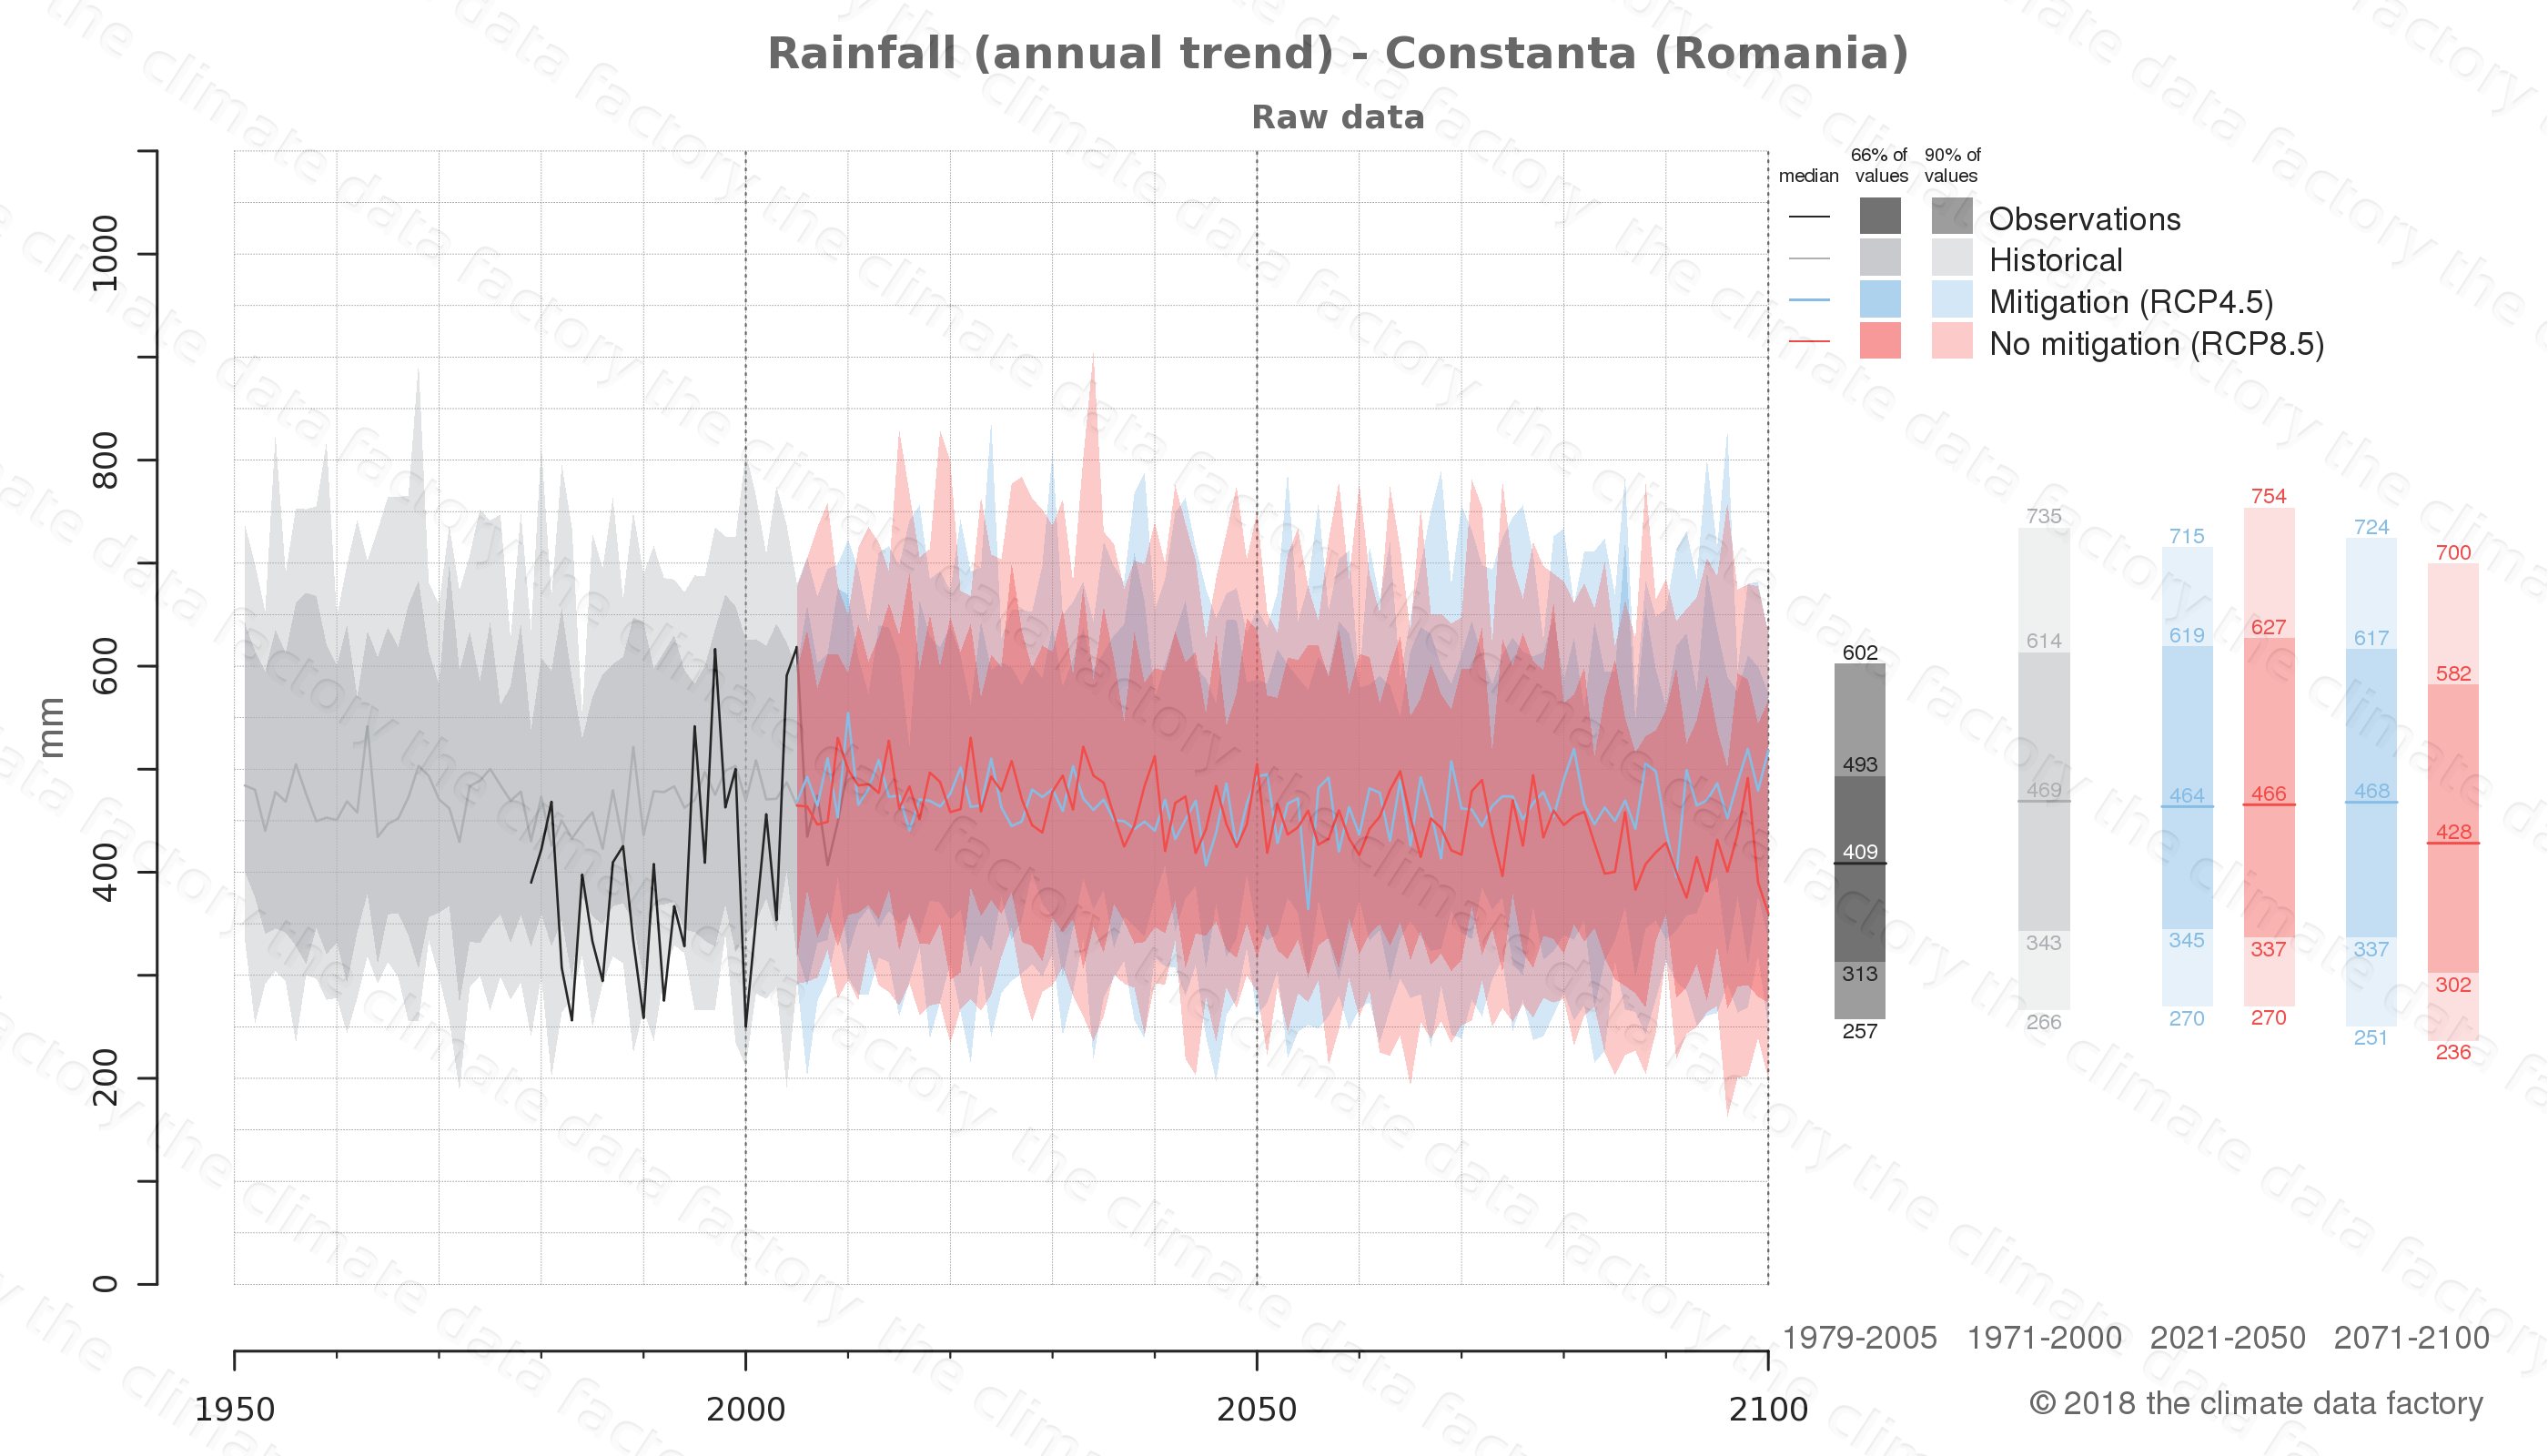 climate change data policy adaptation climate graph city data rainfall constanta romania